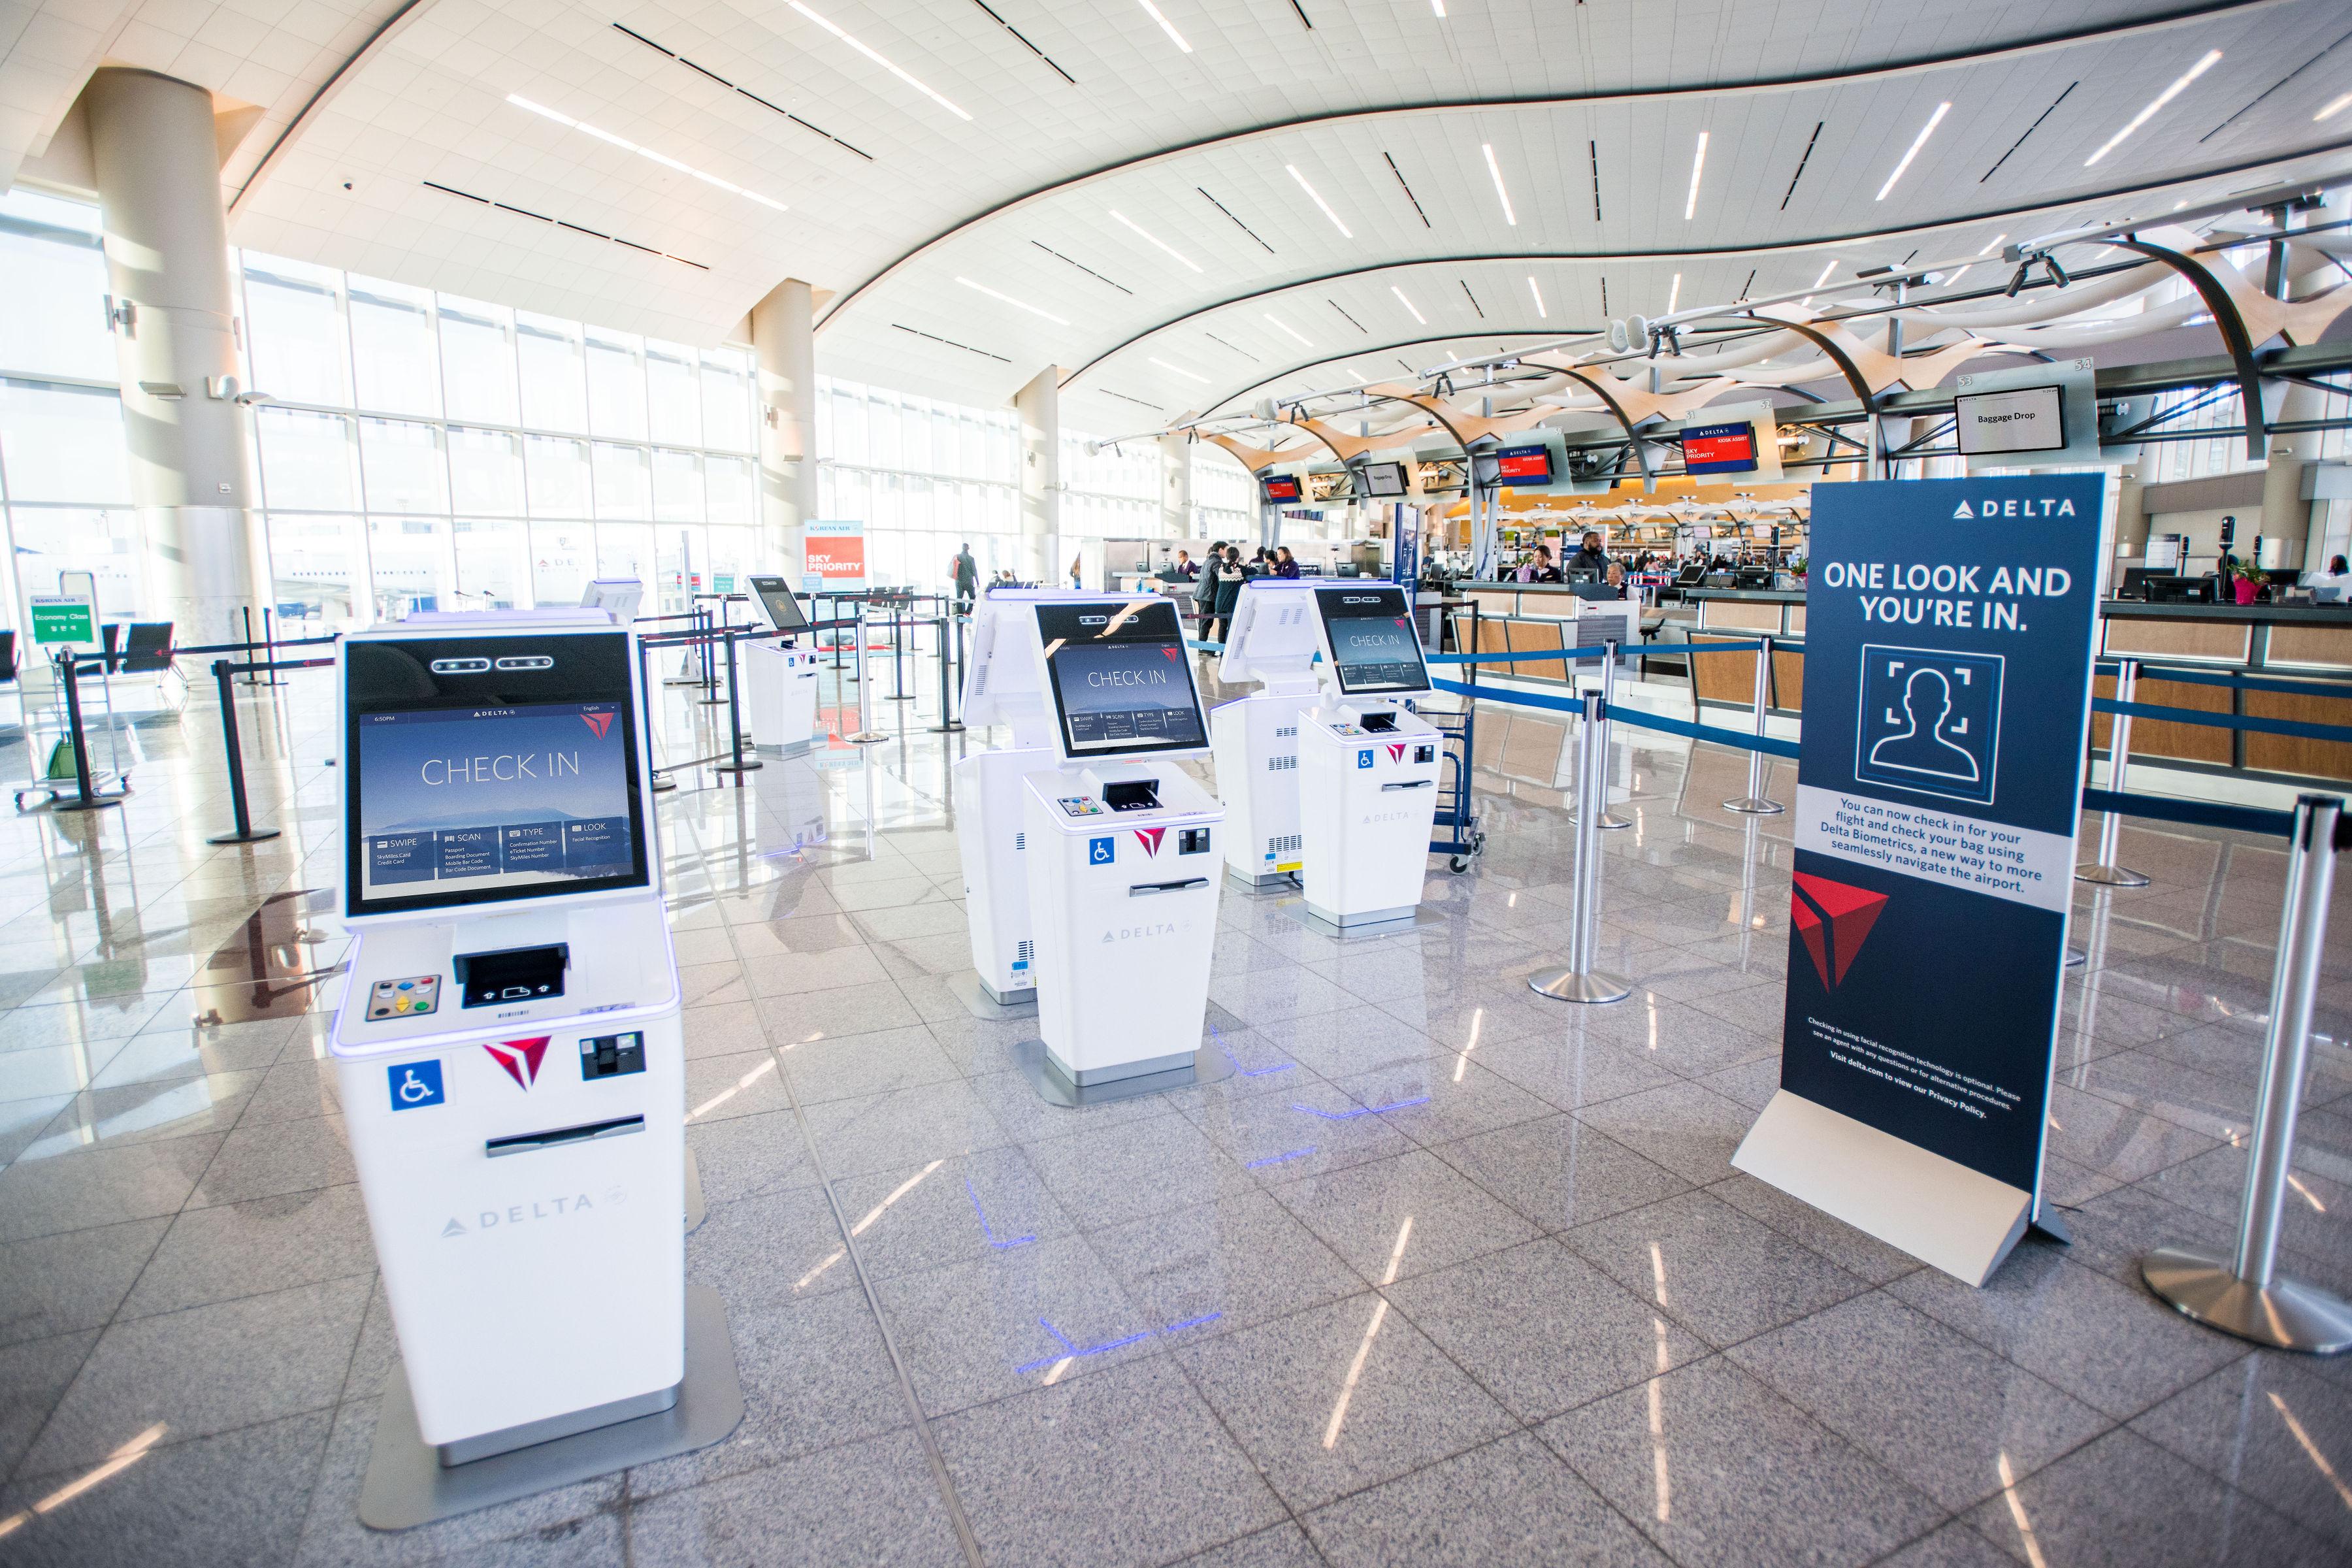 atlanta-airport-terminal-f-self-service-kiosks-with-facial-recognition